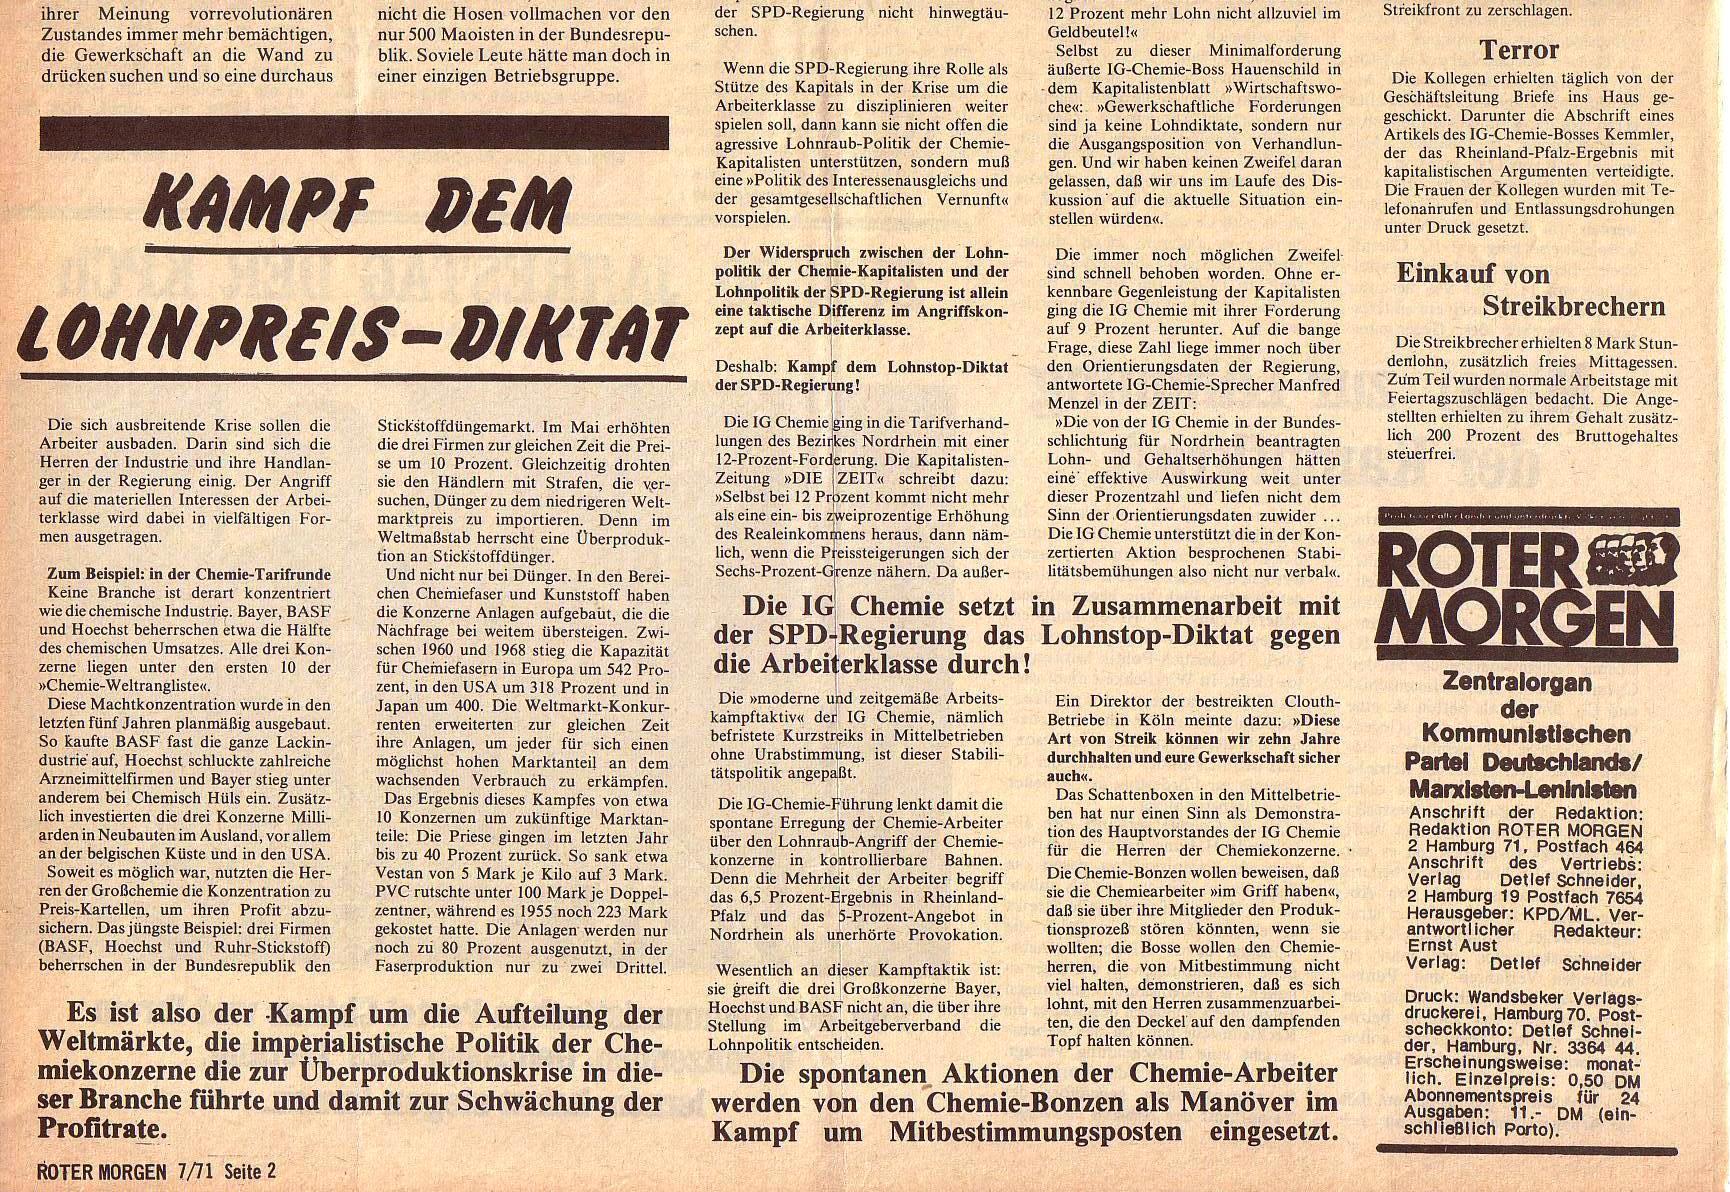 Roter Morgen, 5. Jg., Juli 1971, Nr. 7, Seite 2b